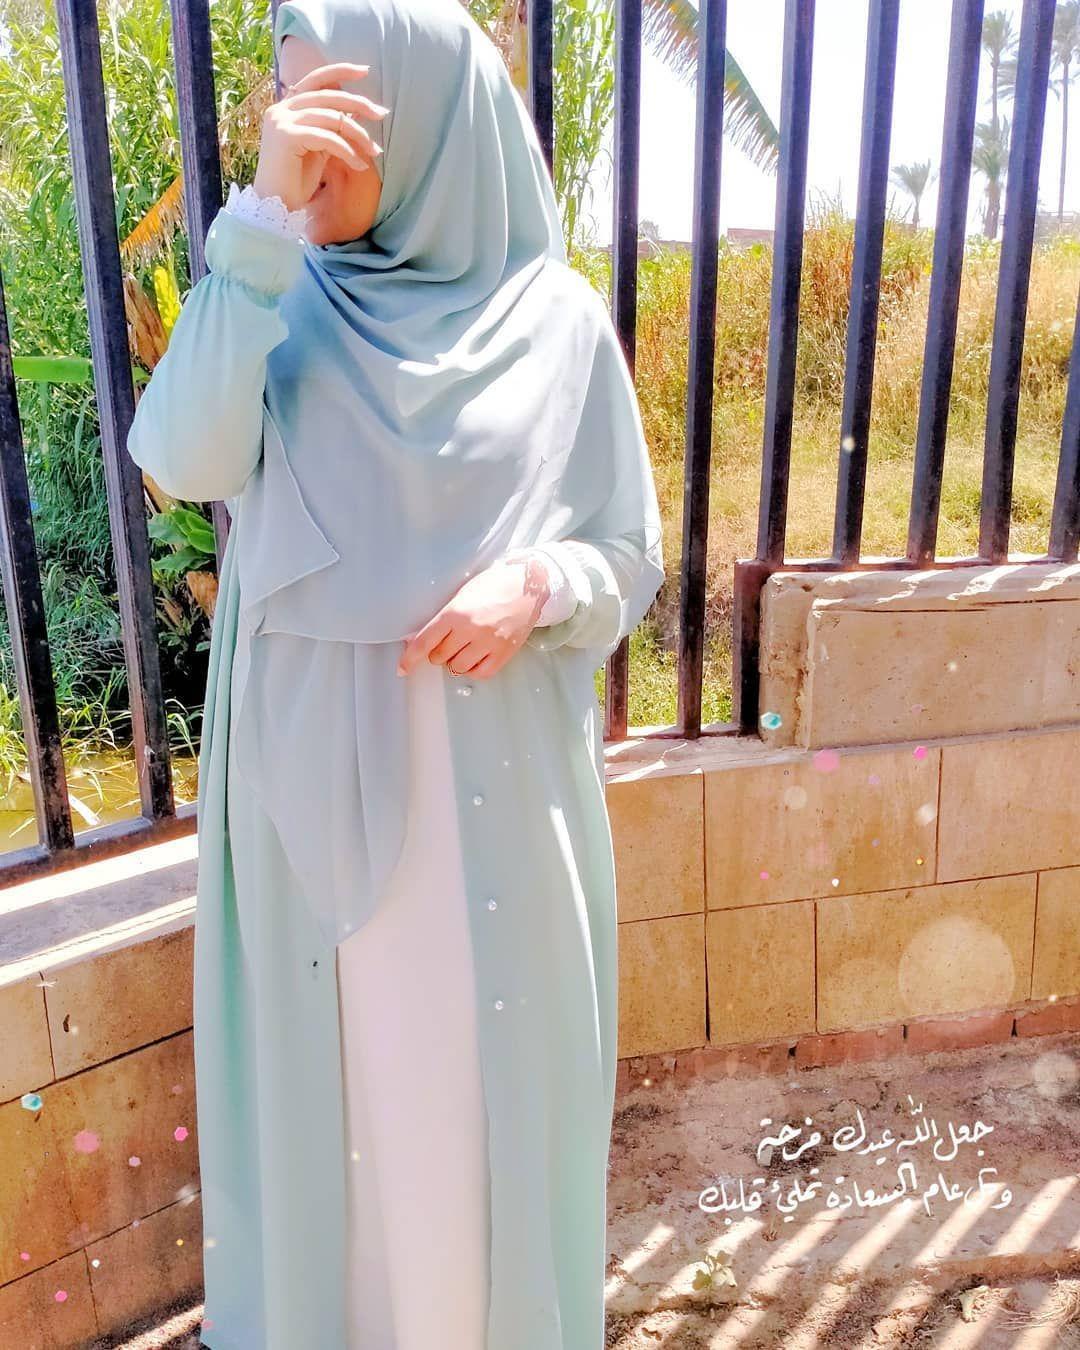 3 362 Likes 52 Comments سآره الحويط Sarah Elhawet Sarah M Elhawet99 On Instagram Modest Fashion Hijab Muslim Fashion Outfits Muslimah Fashion Outfits